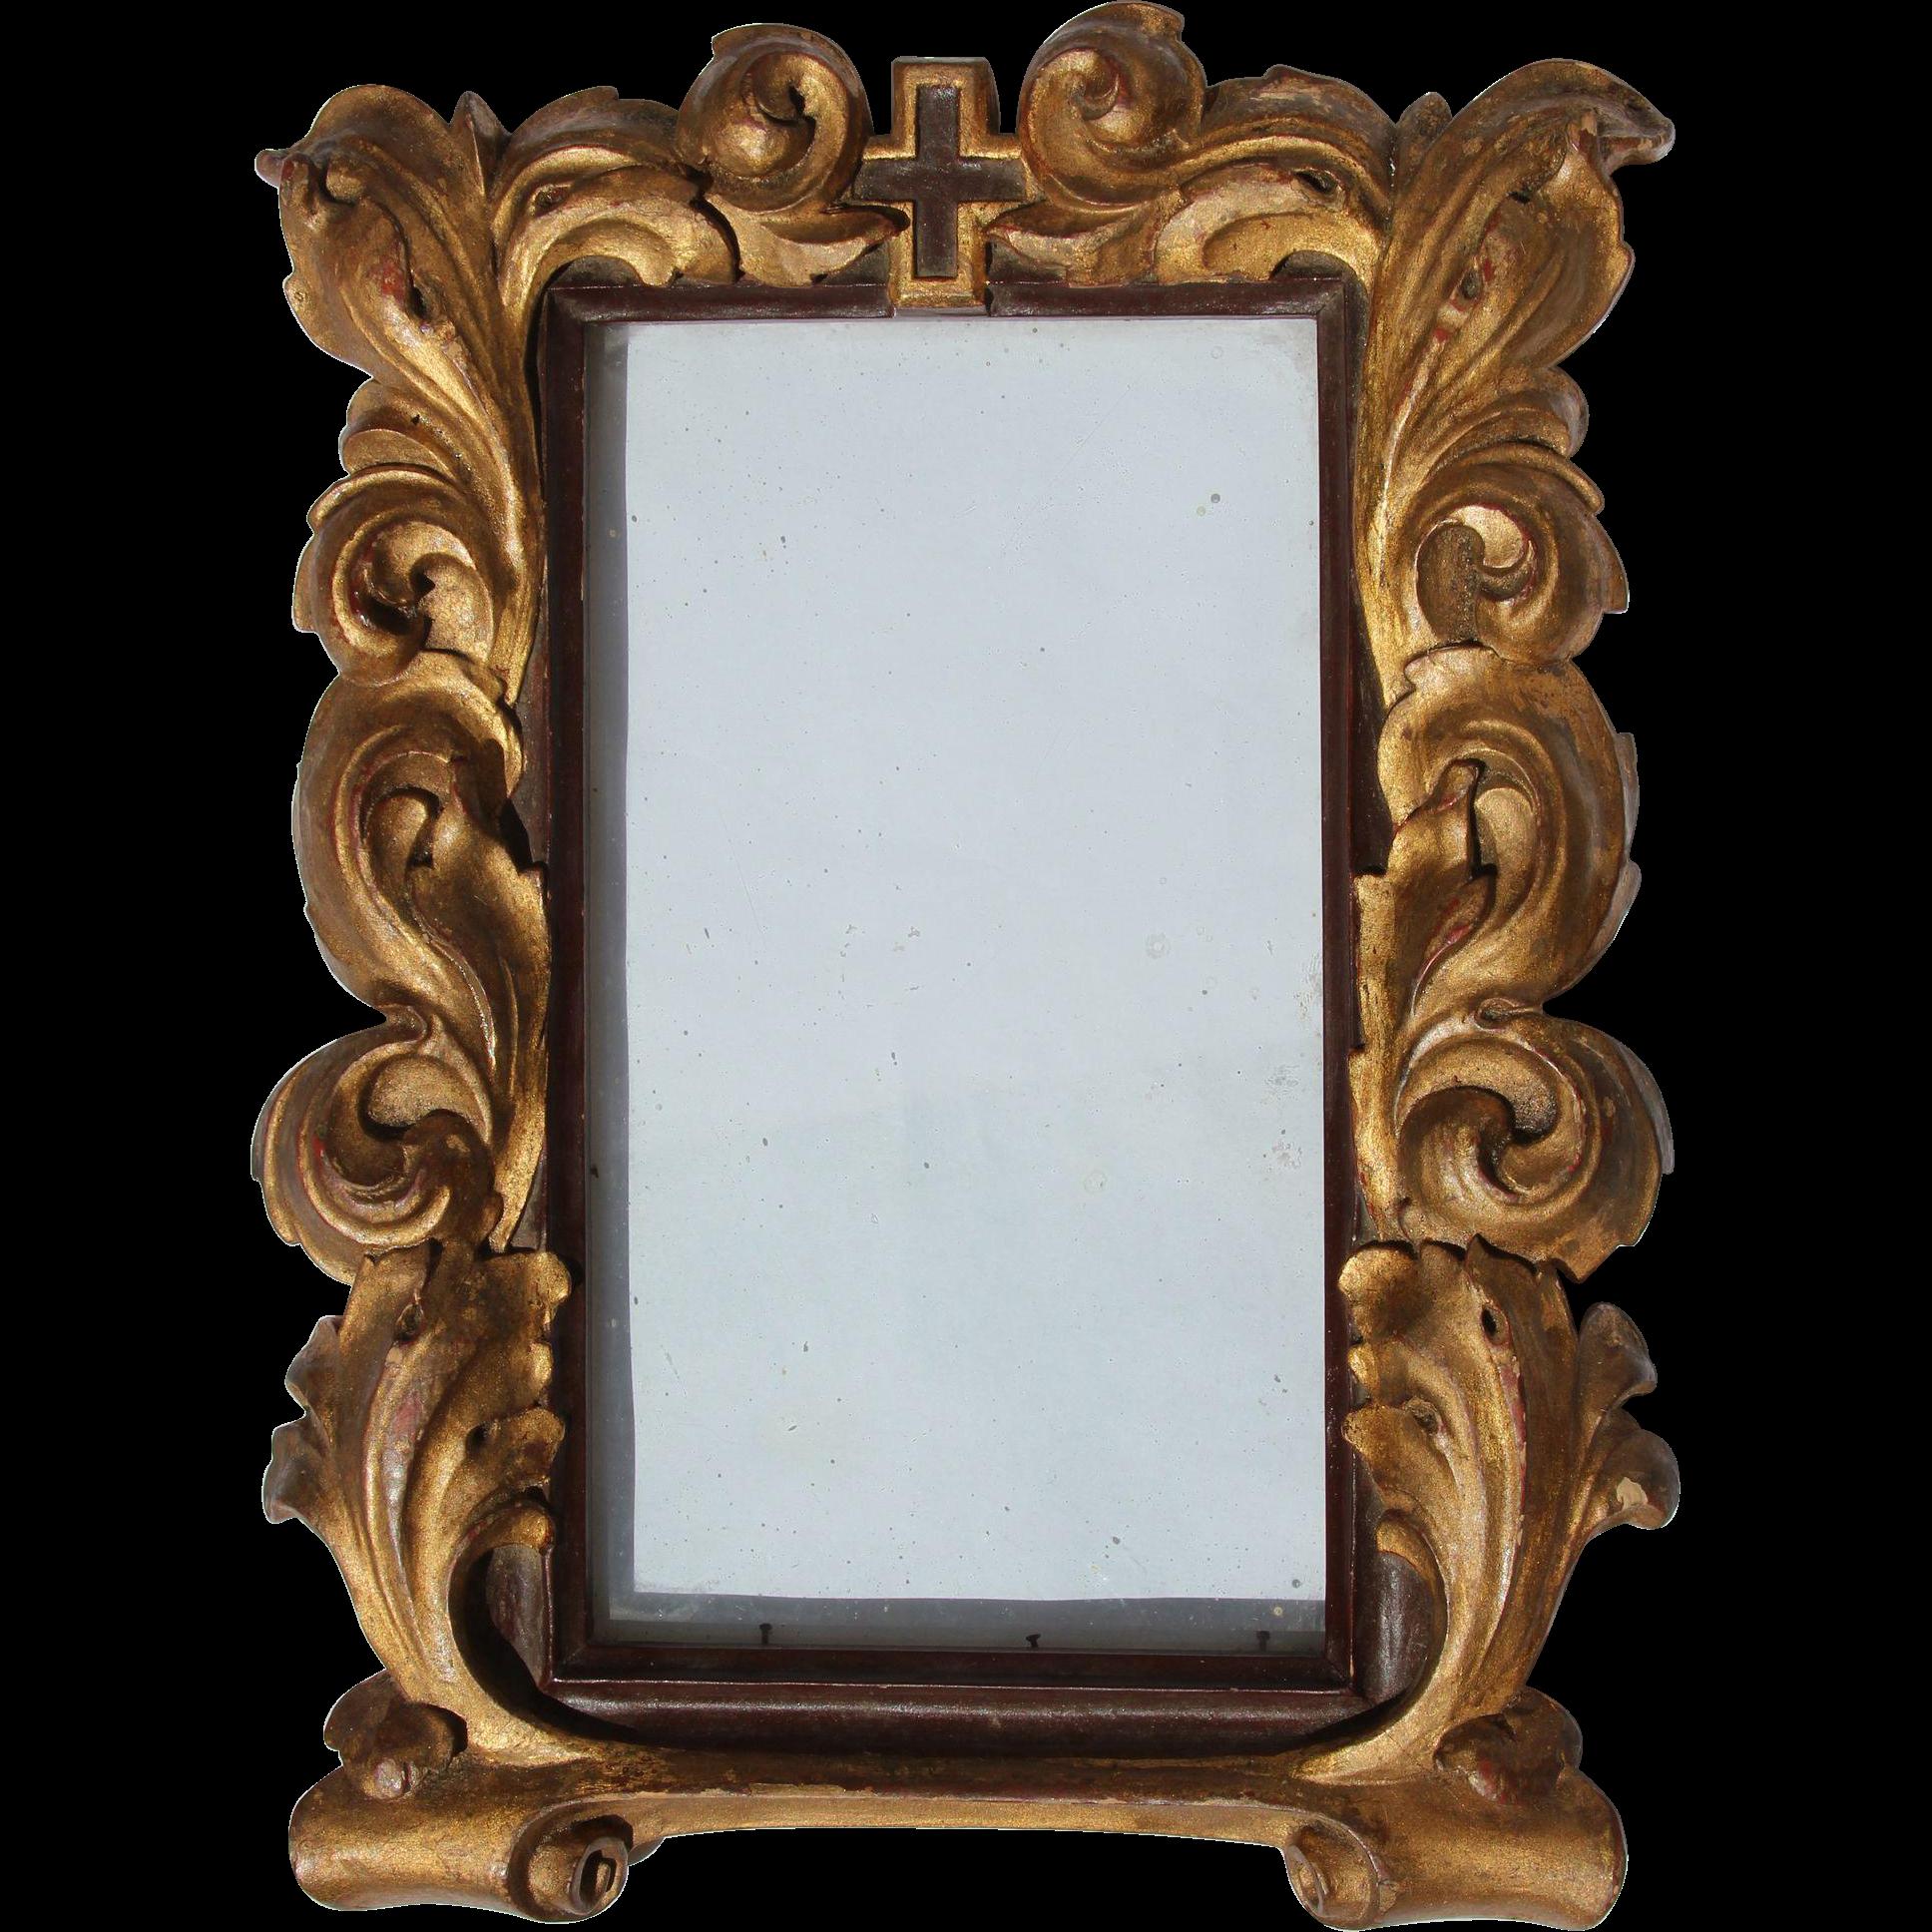 Original th century wood. Baroque frame png